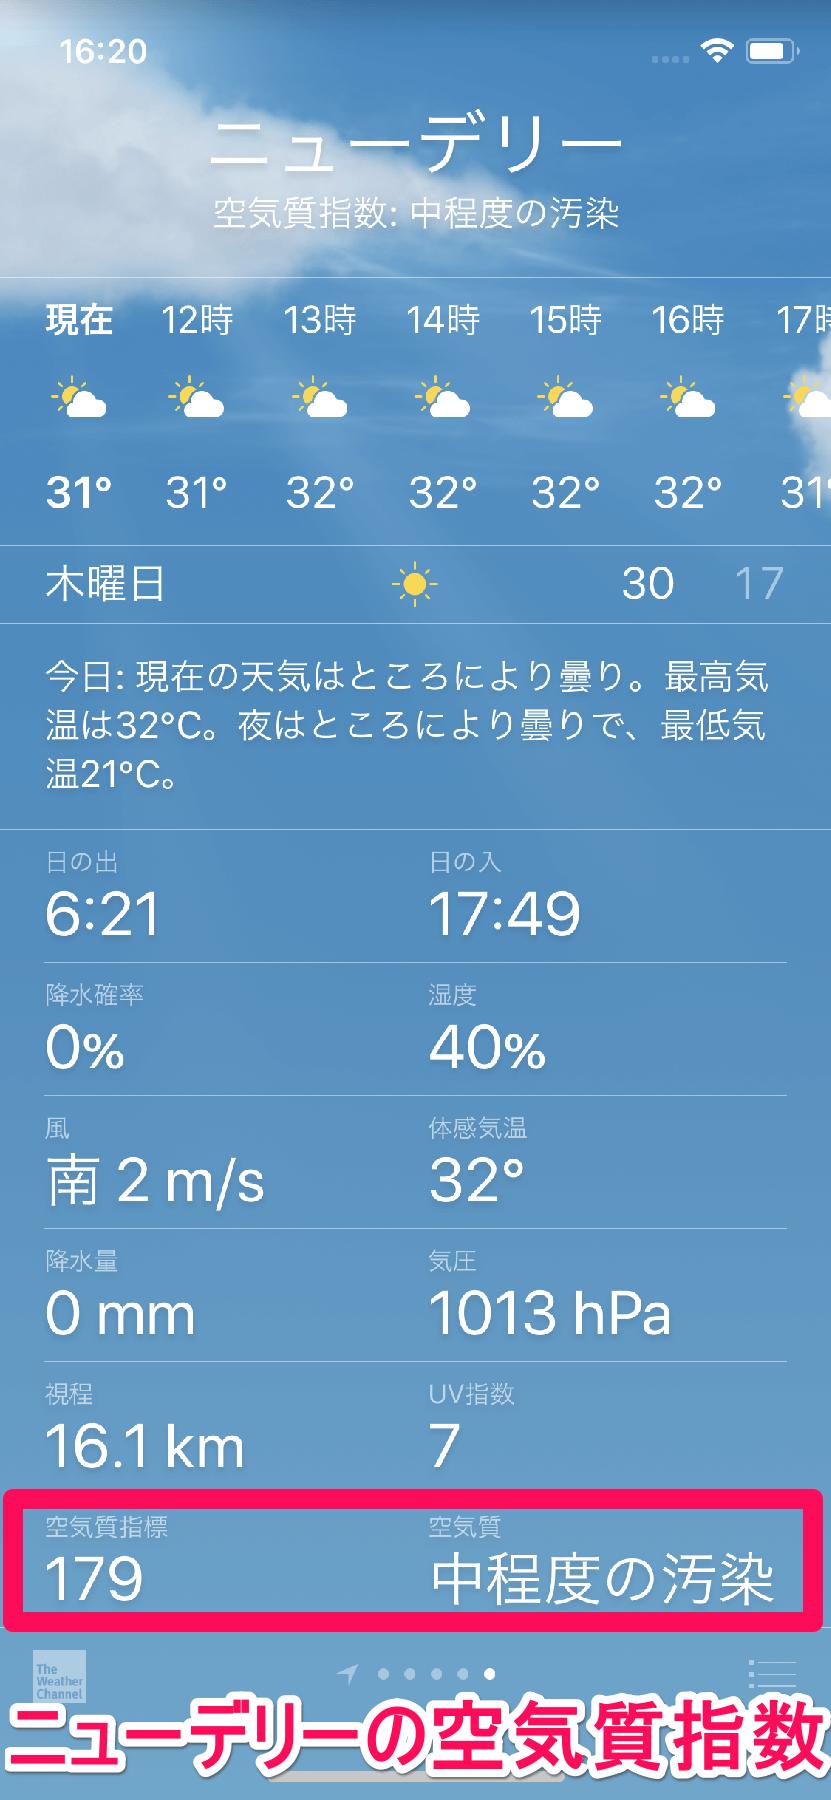 iPhone(アイフォーン、アイフォン)の天気アプリでニューデリー(インド)の空気質指数と空気質を表示した画面